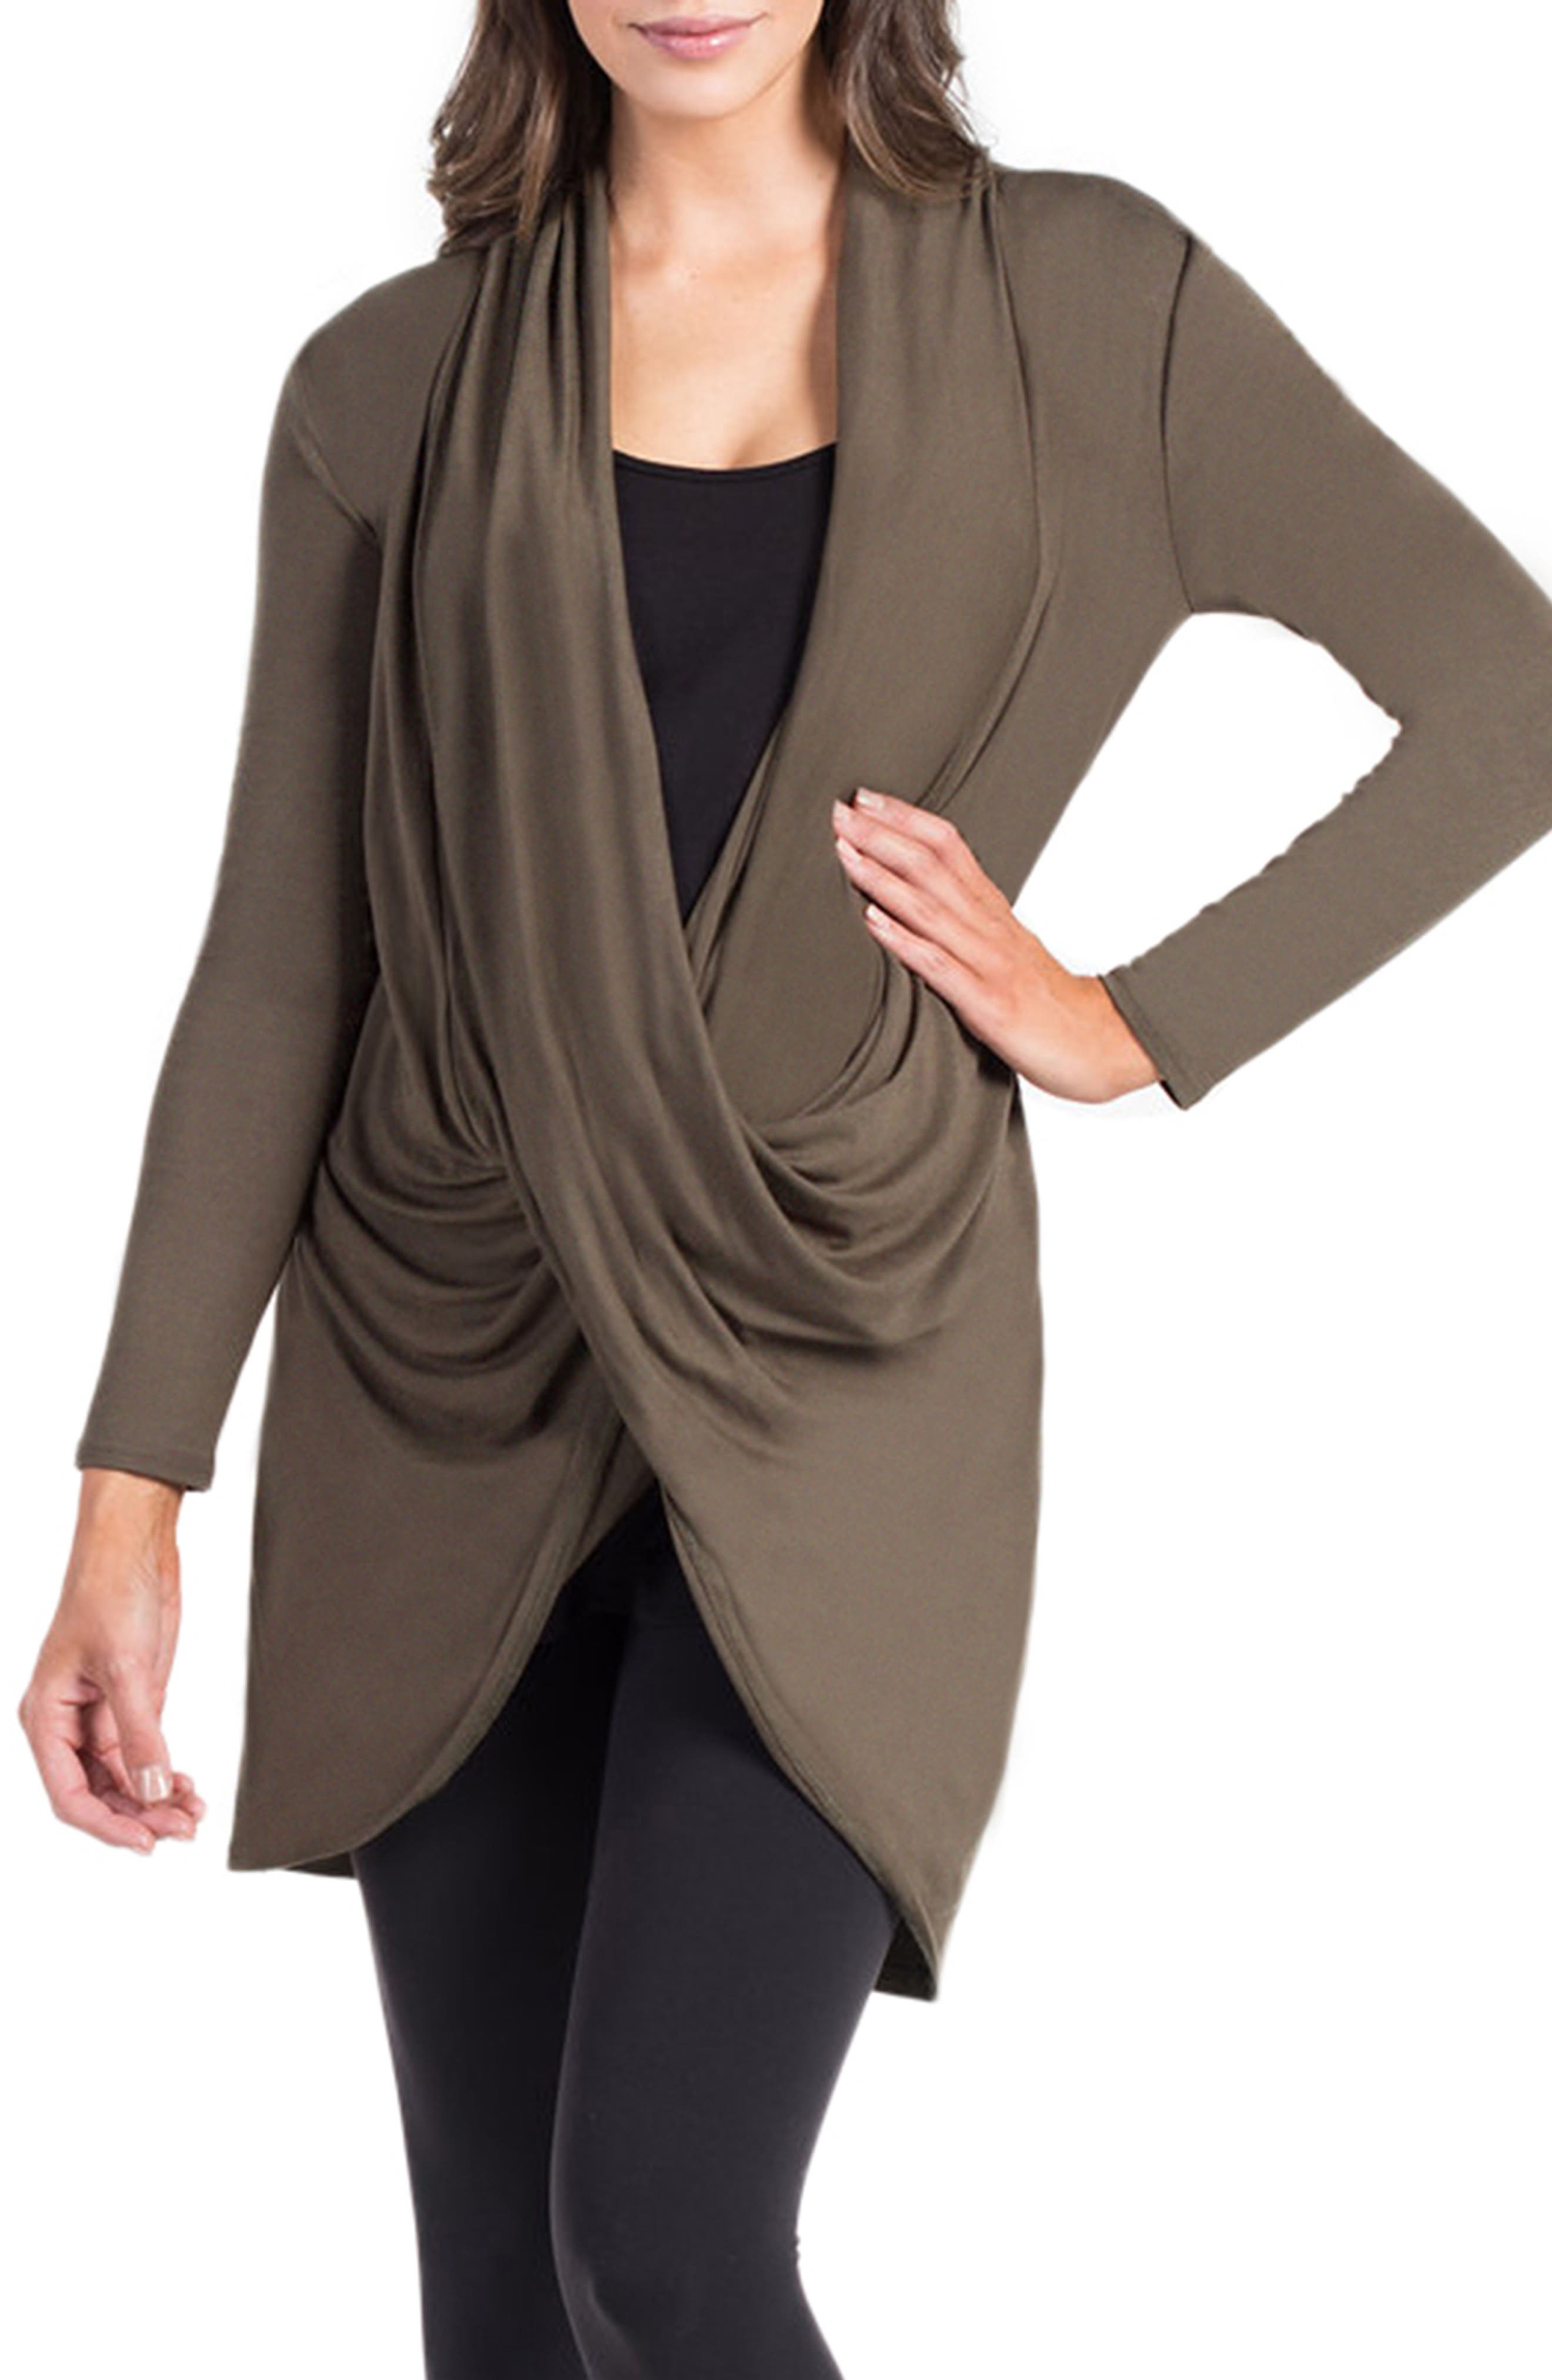 Nara Crossover Maternity/Nursing Tunic with Camisole,                         Main,                         color, DARK OLIVE/ BLACK CAMI